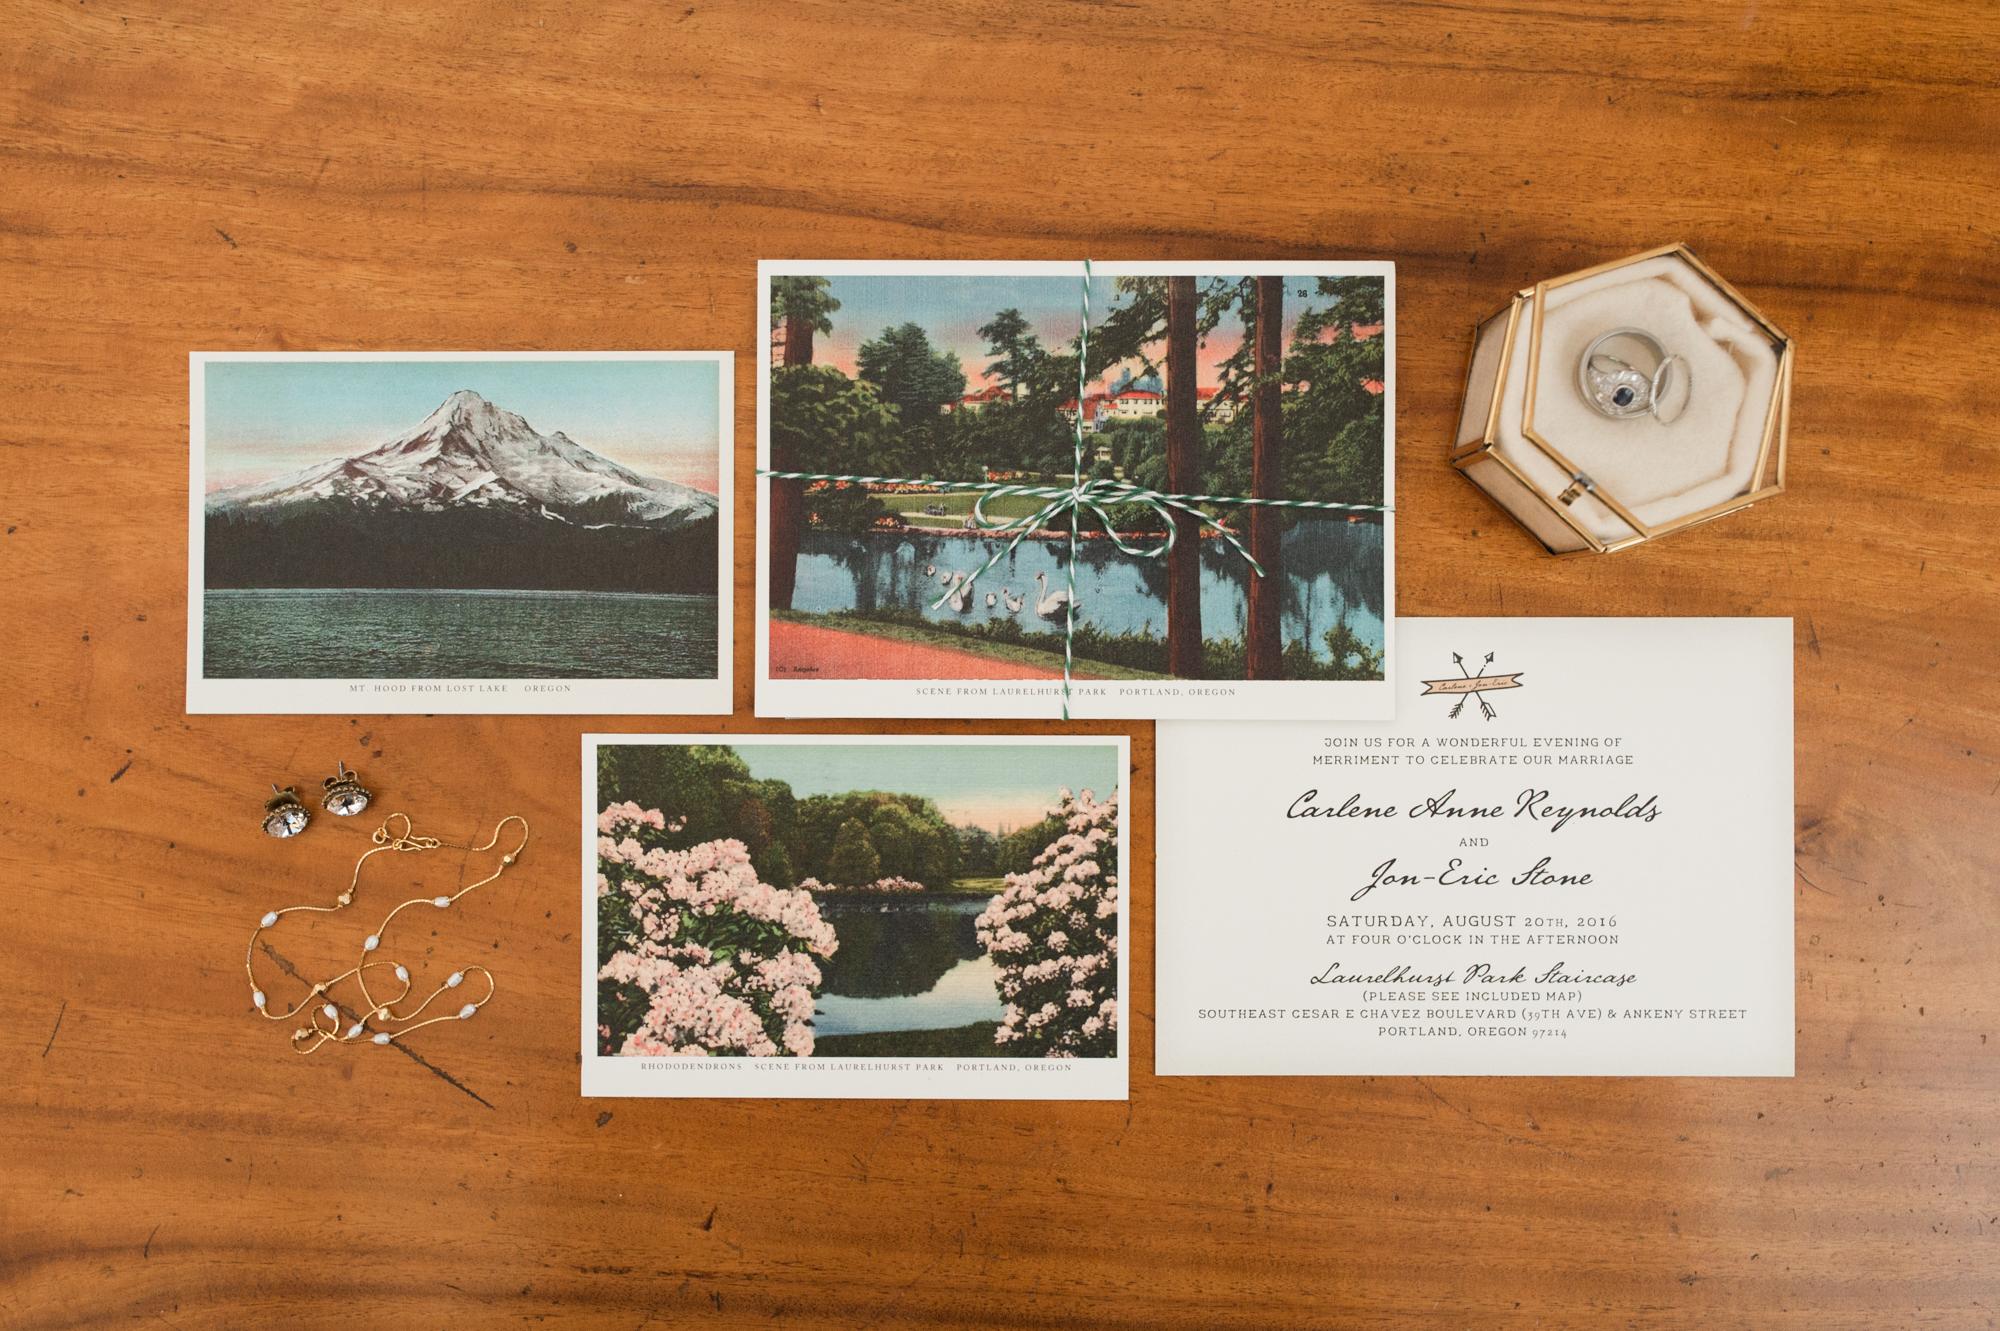 Beautiful custom wedding invitation and jewelry. By Laurelhurst Park wedding photographer Briana Morrison